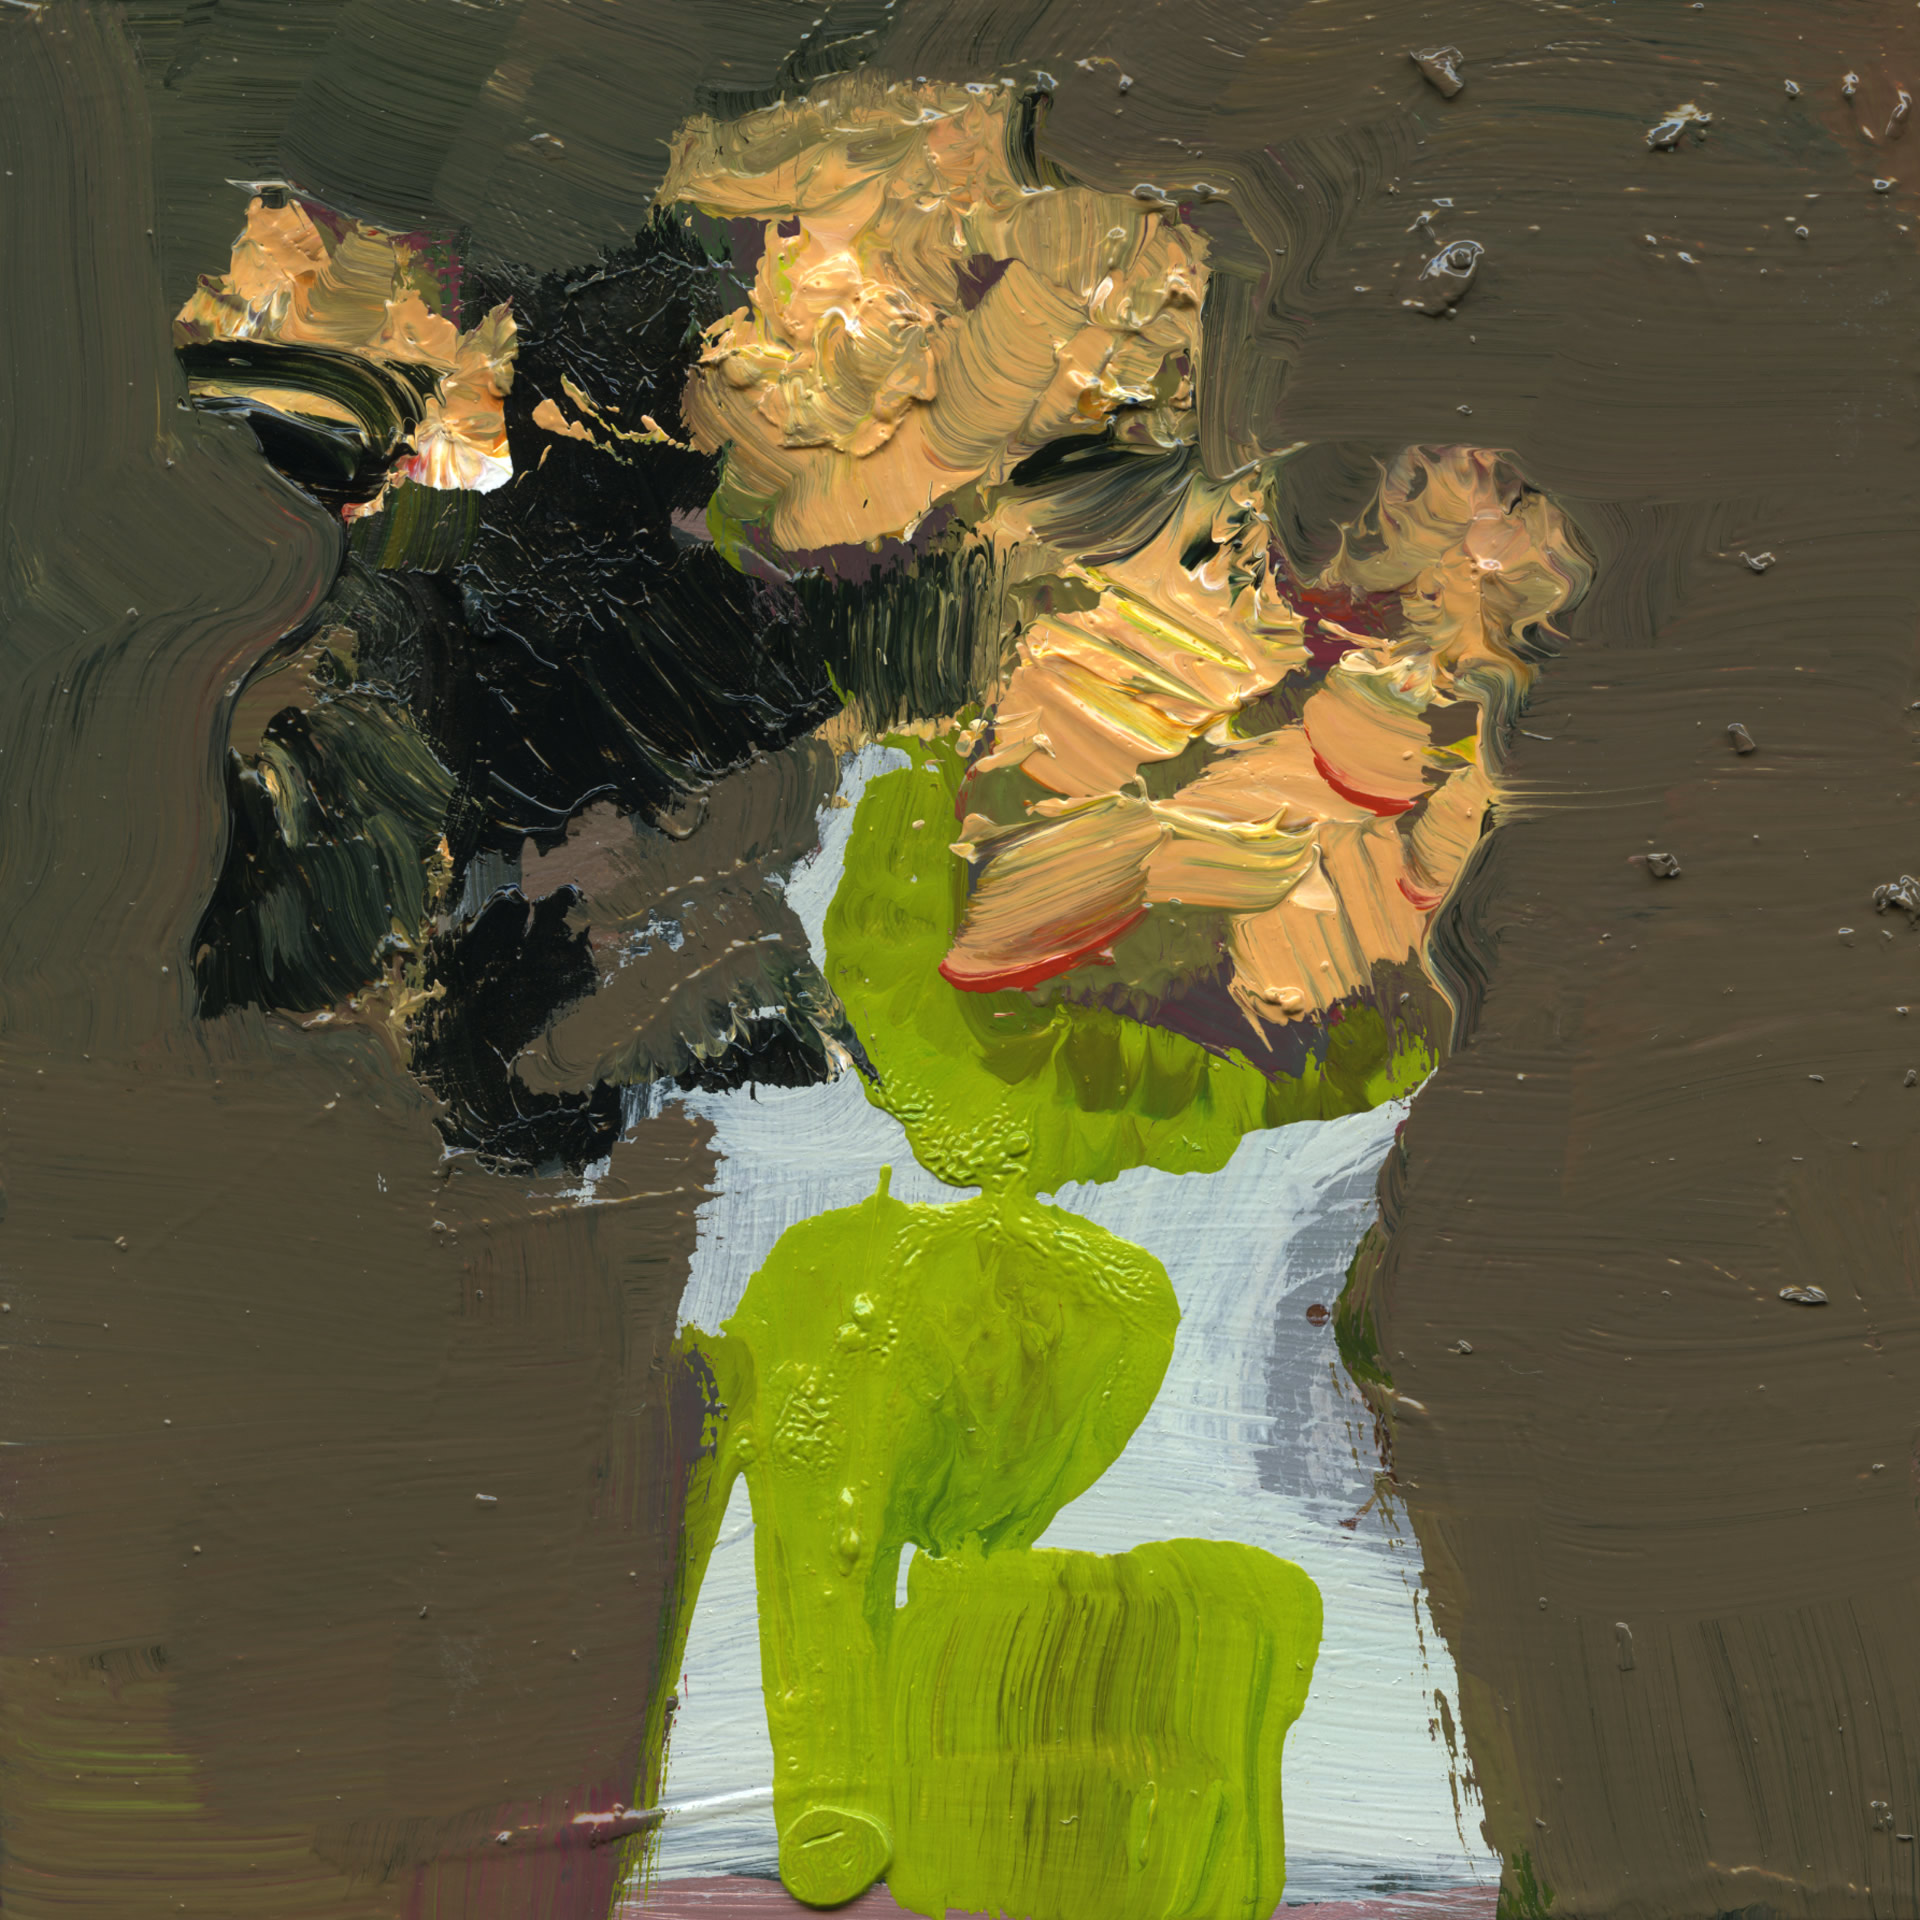 Jennifer-Hornyak-White-with-Lime-Green-6x6-Online-Art-Galleries-